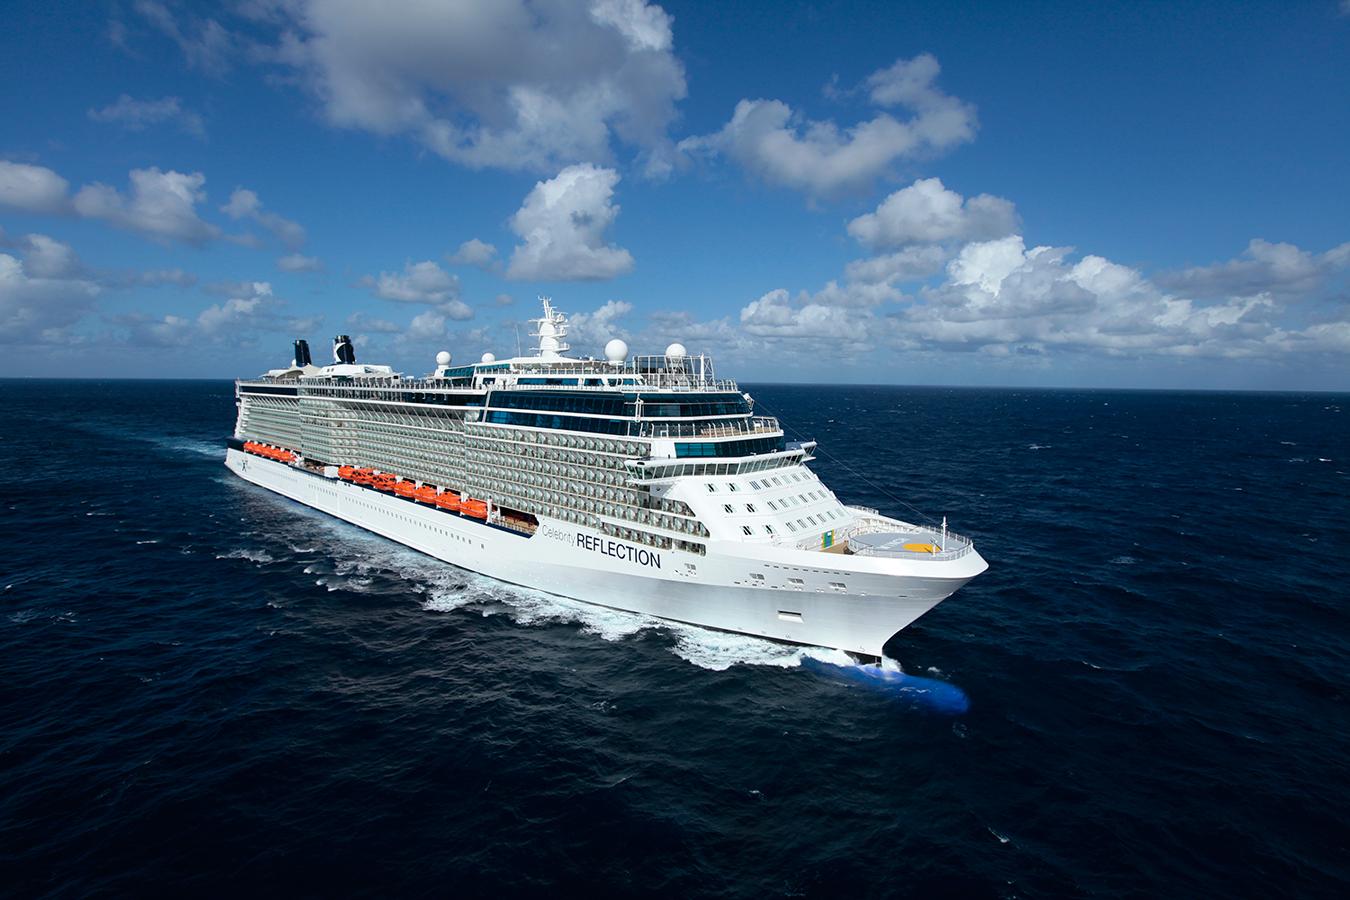 June 2019 cruises to Norwegian Fjords, Baltic Sea ...